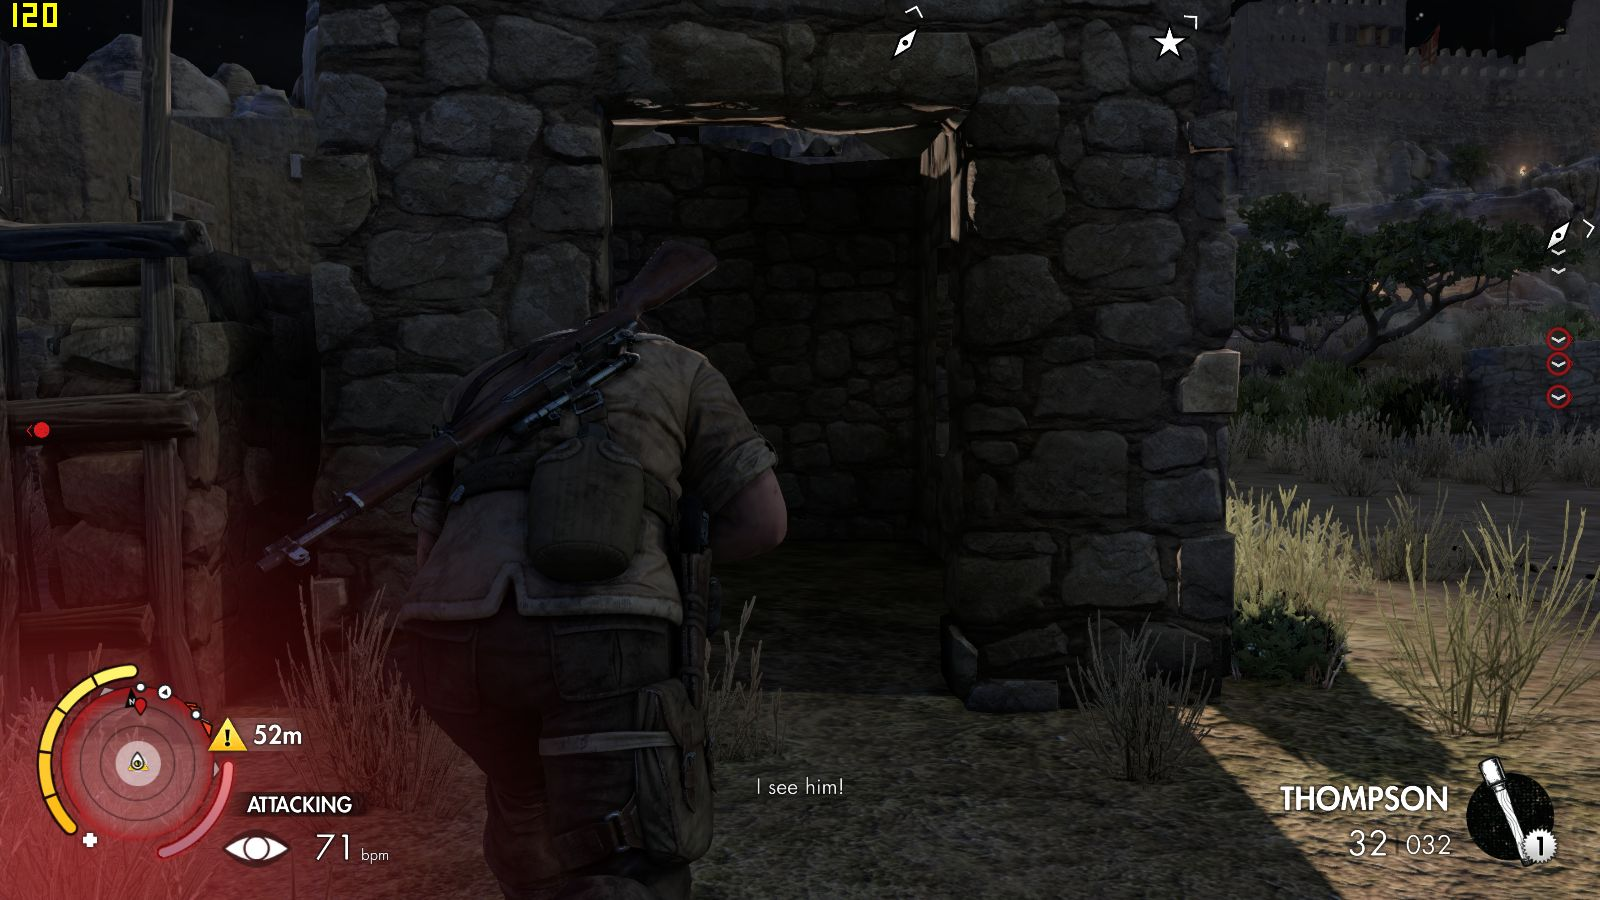 SniperElite3 2018-07-25 16-56-28-98